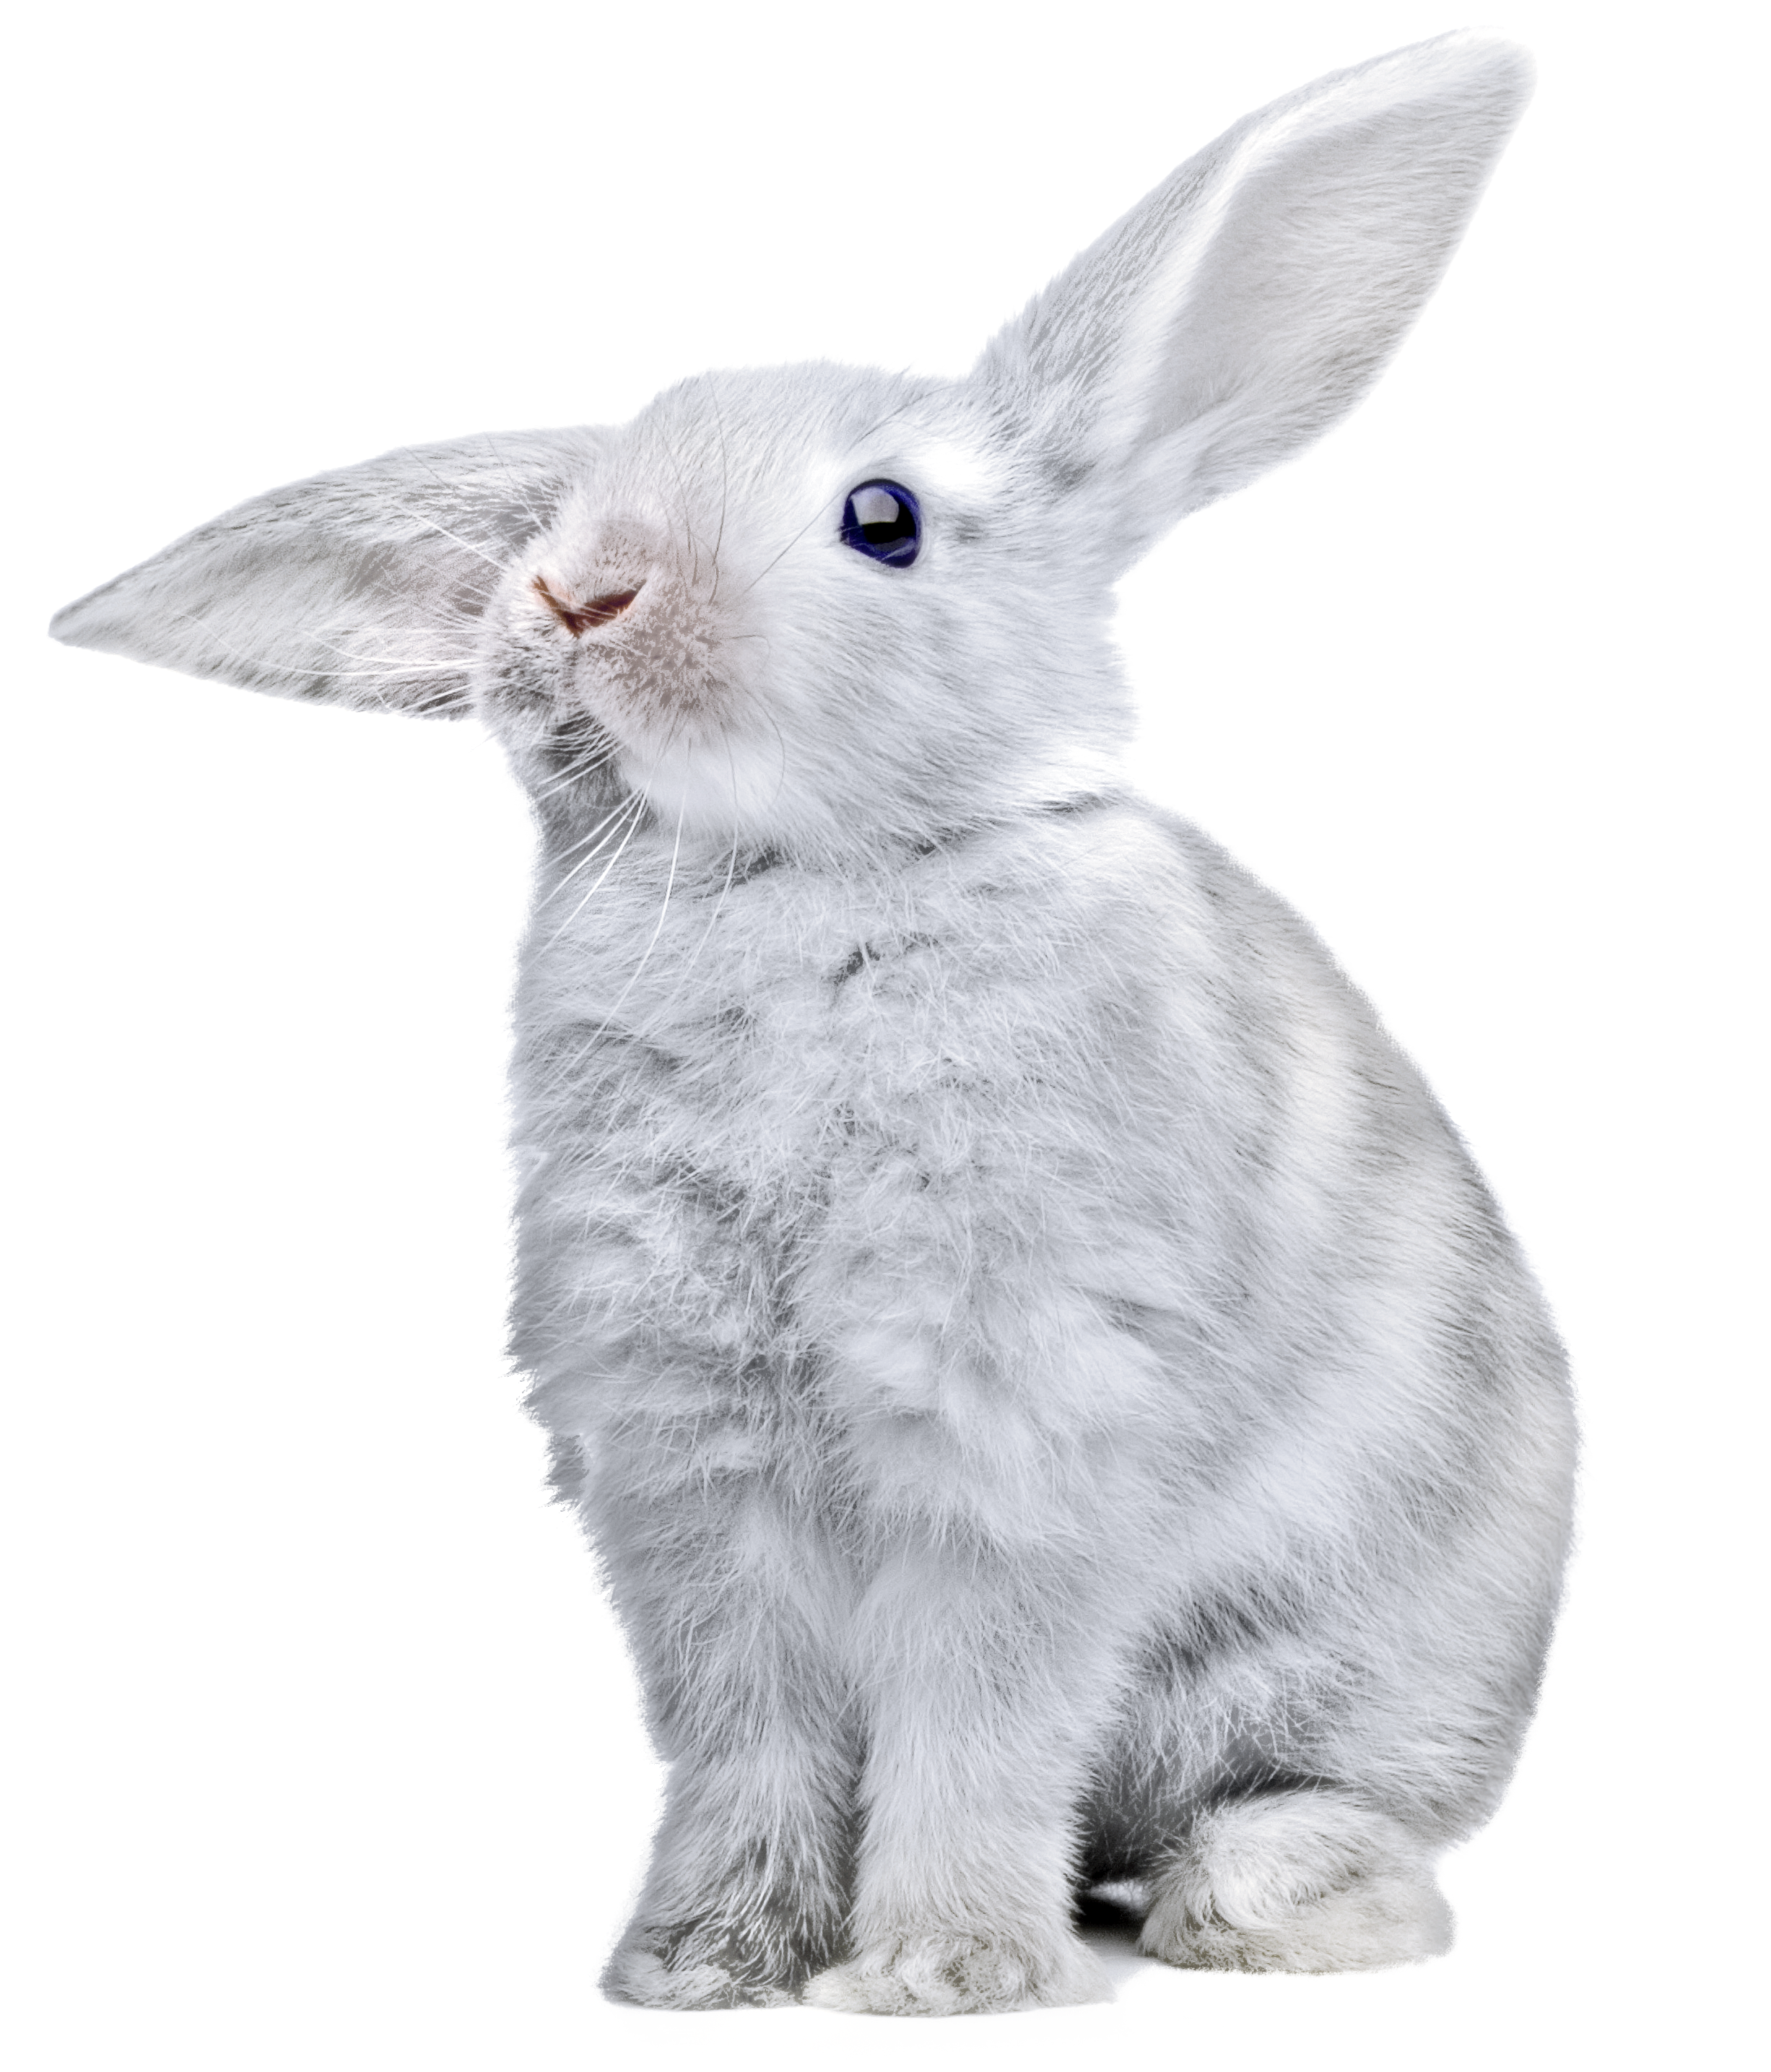 White Rabbit Png Image - Rabbit, Transparent background PNG HD thumbnail